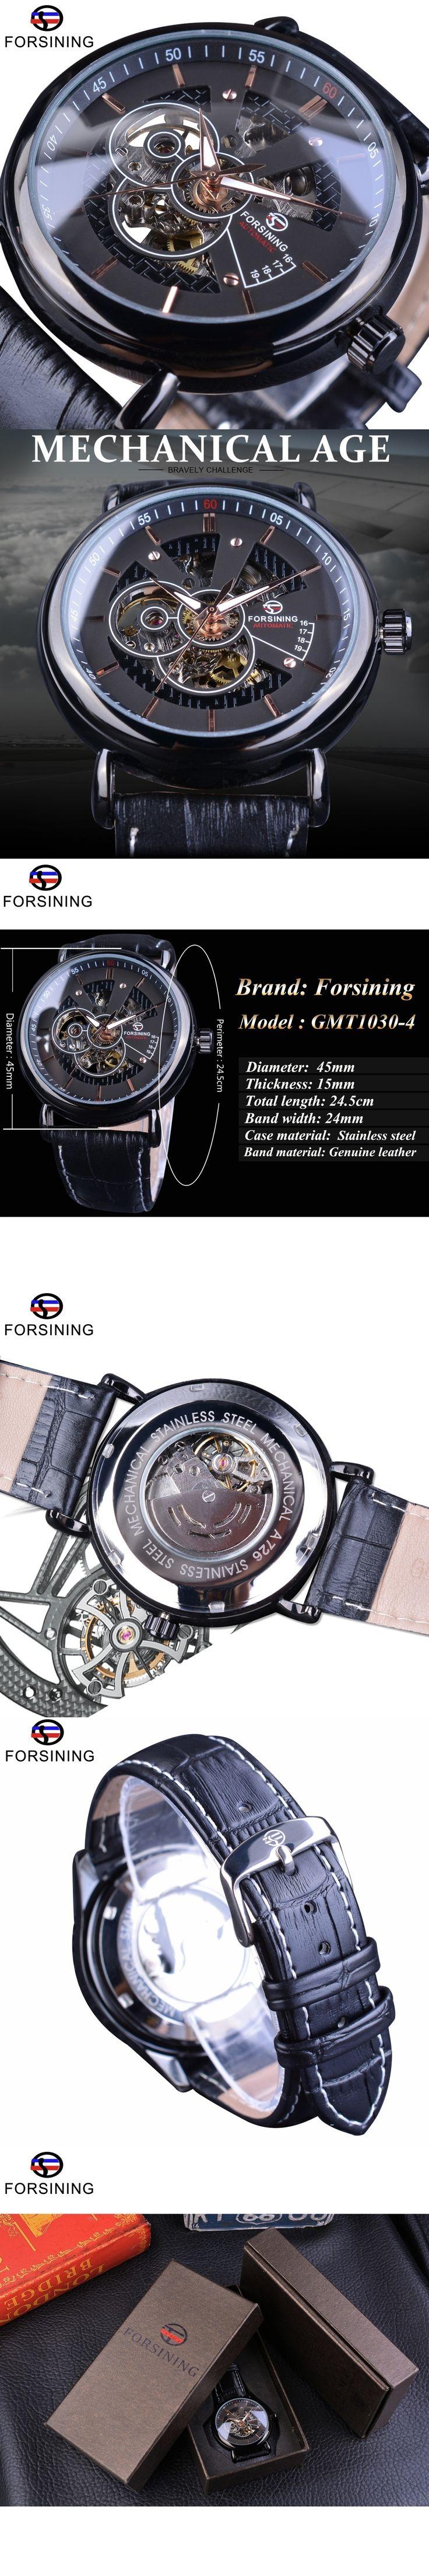 Forsining Transparent Case Avigator Series Genuine Leather Strap Fashion Skeleton Design Men Automatic Watches Top Brand Luxury